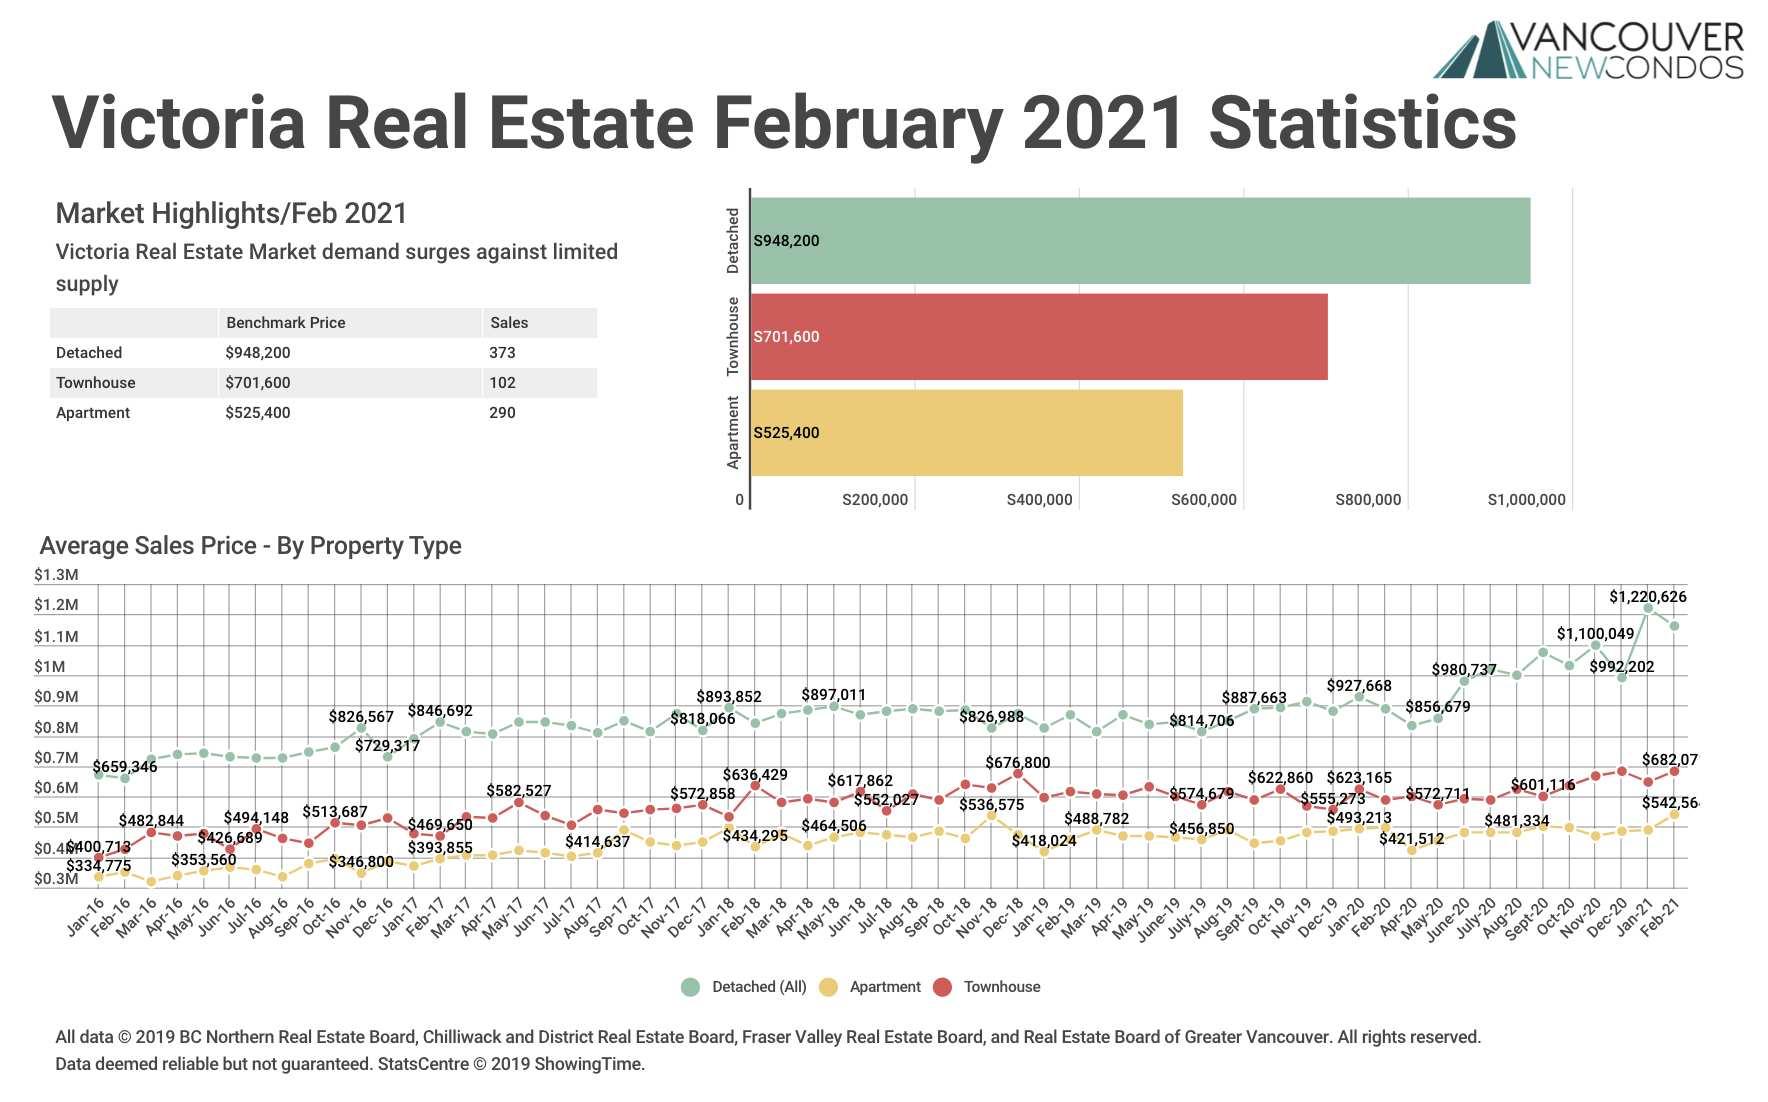 Feb 21 VREB Stats Graph